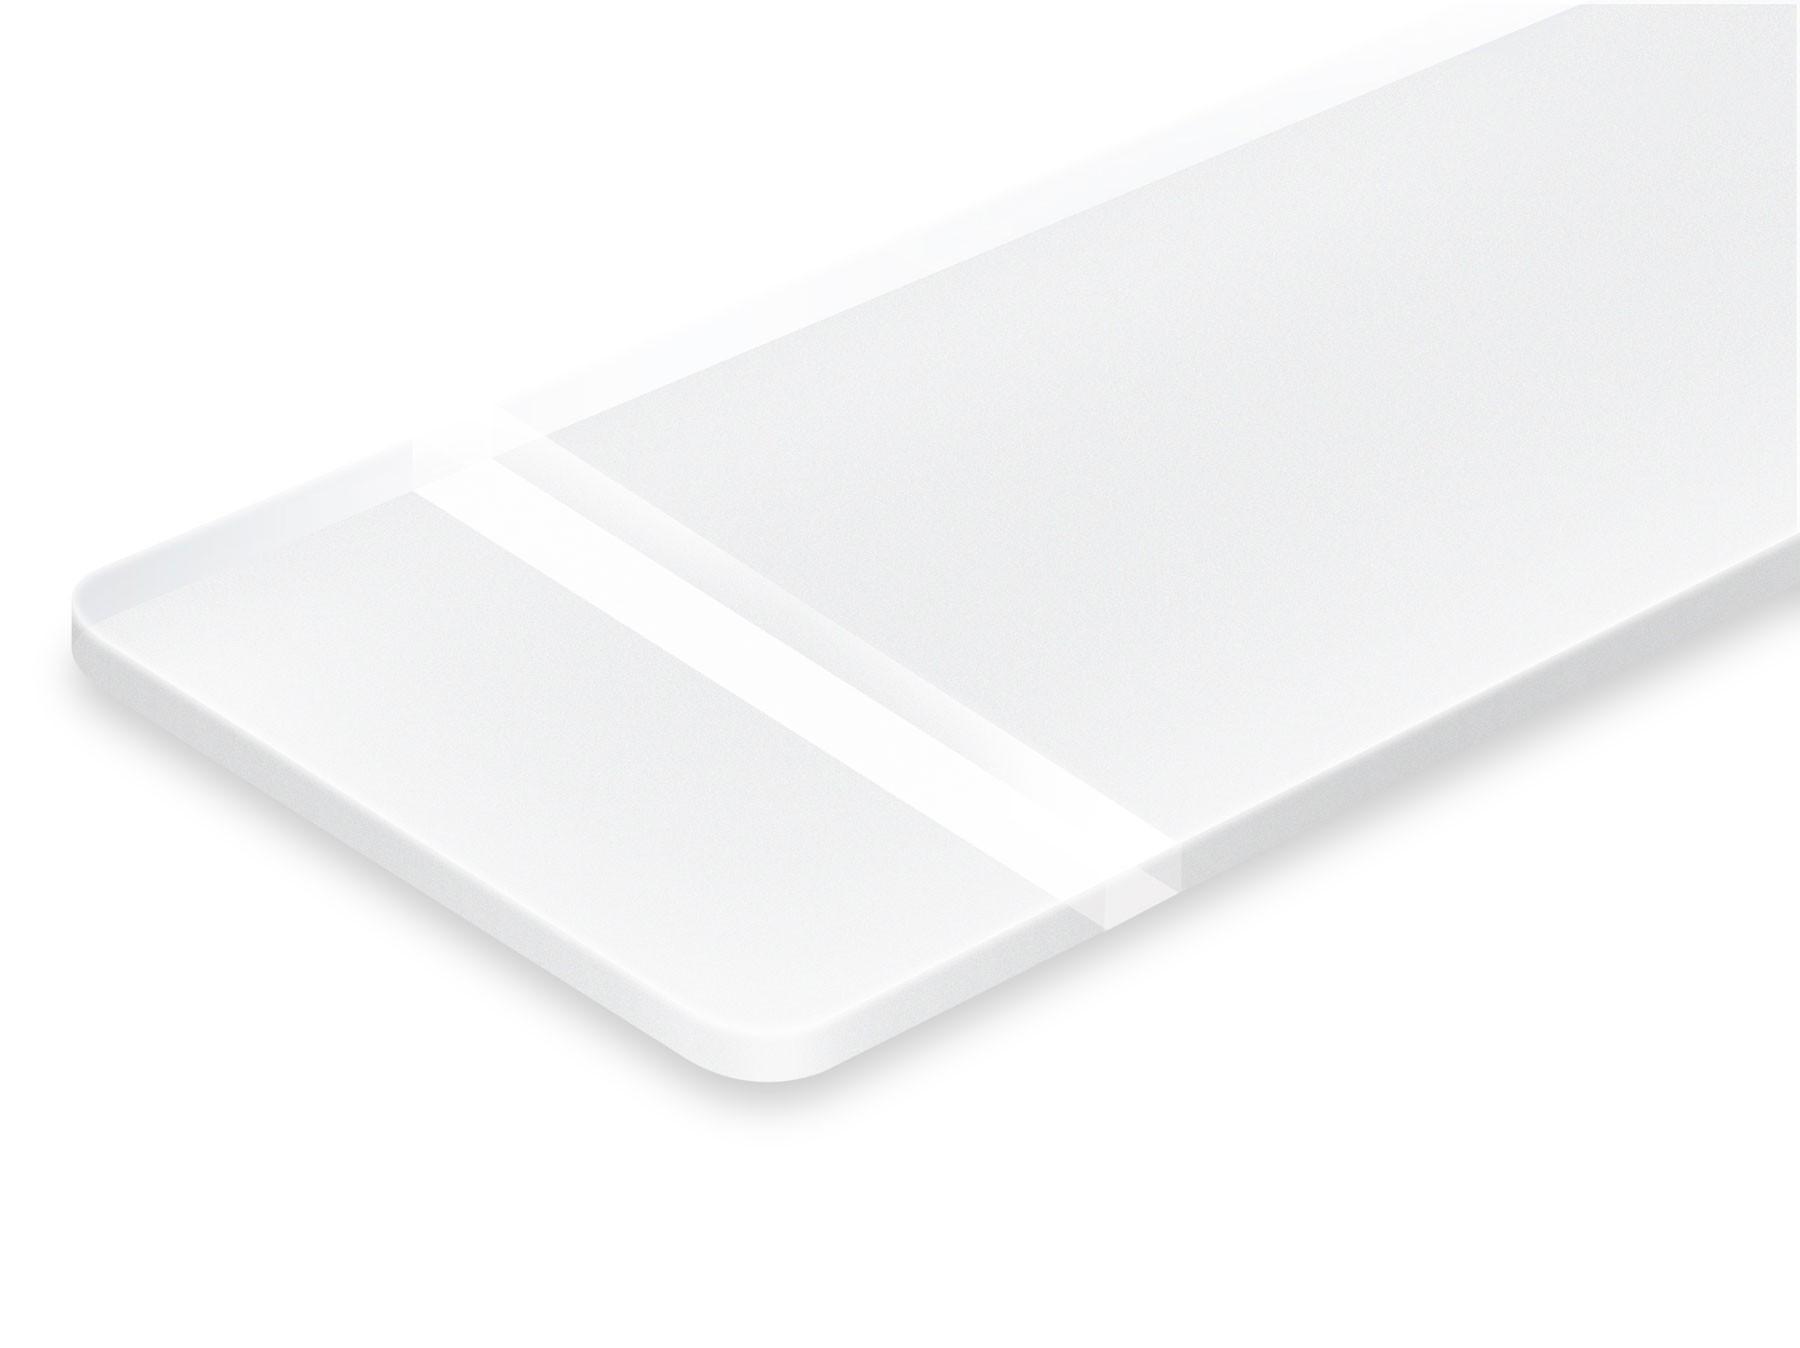 PUR201-206 Matte/White 1,6mm